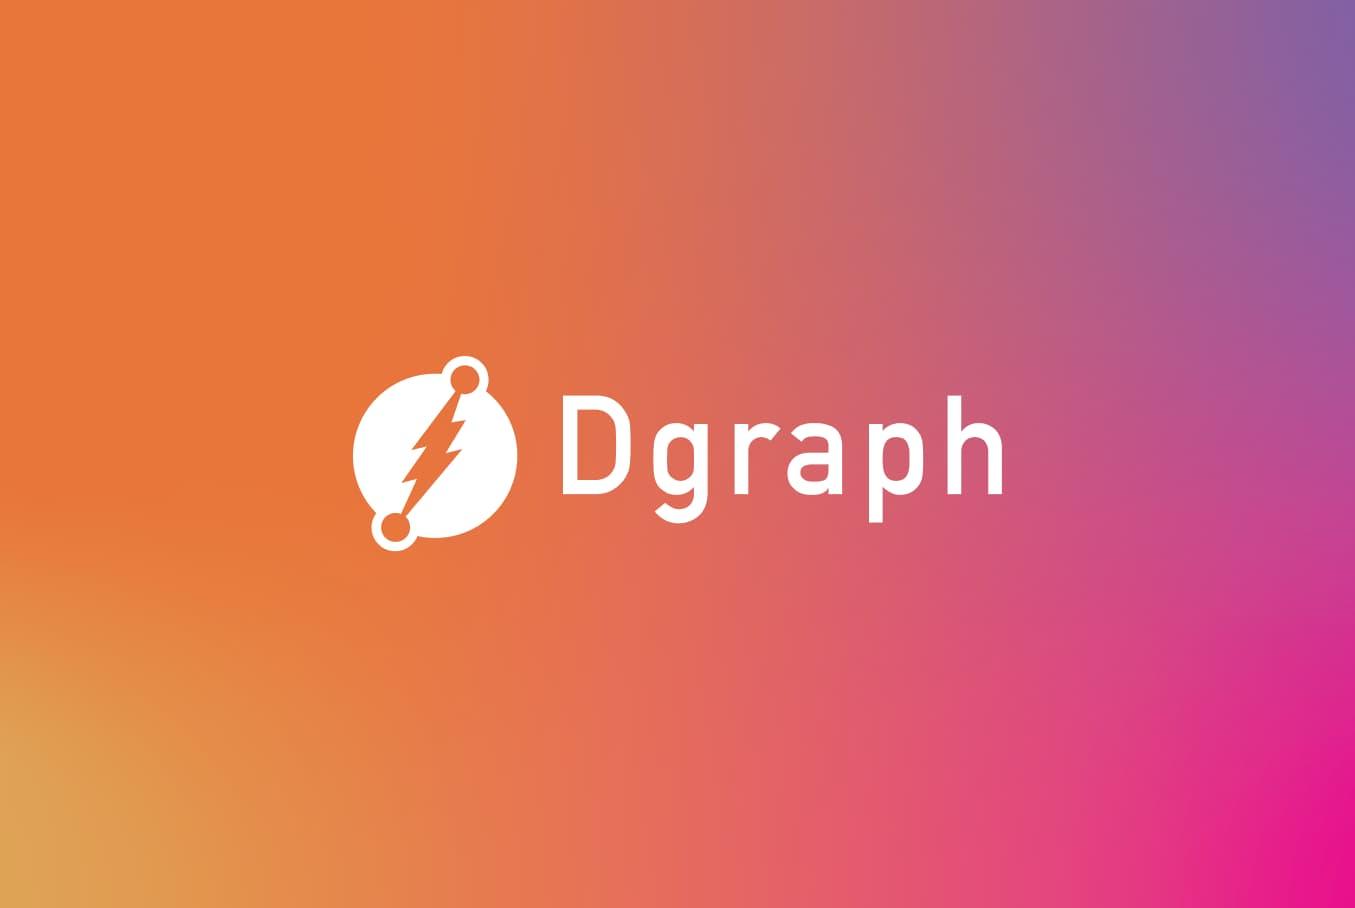 Dgraph logo on a gradient background